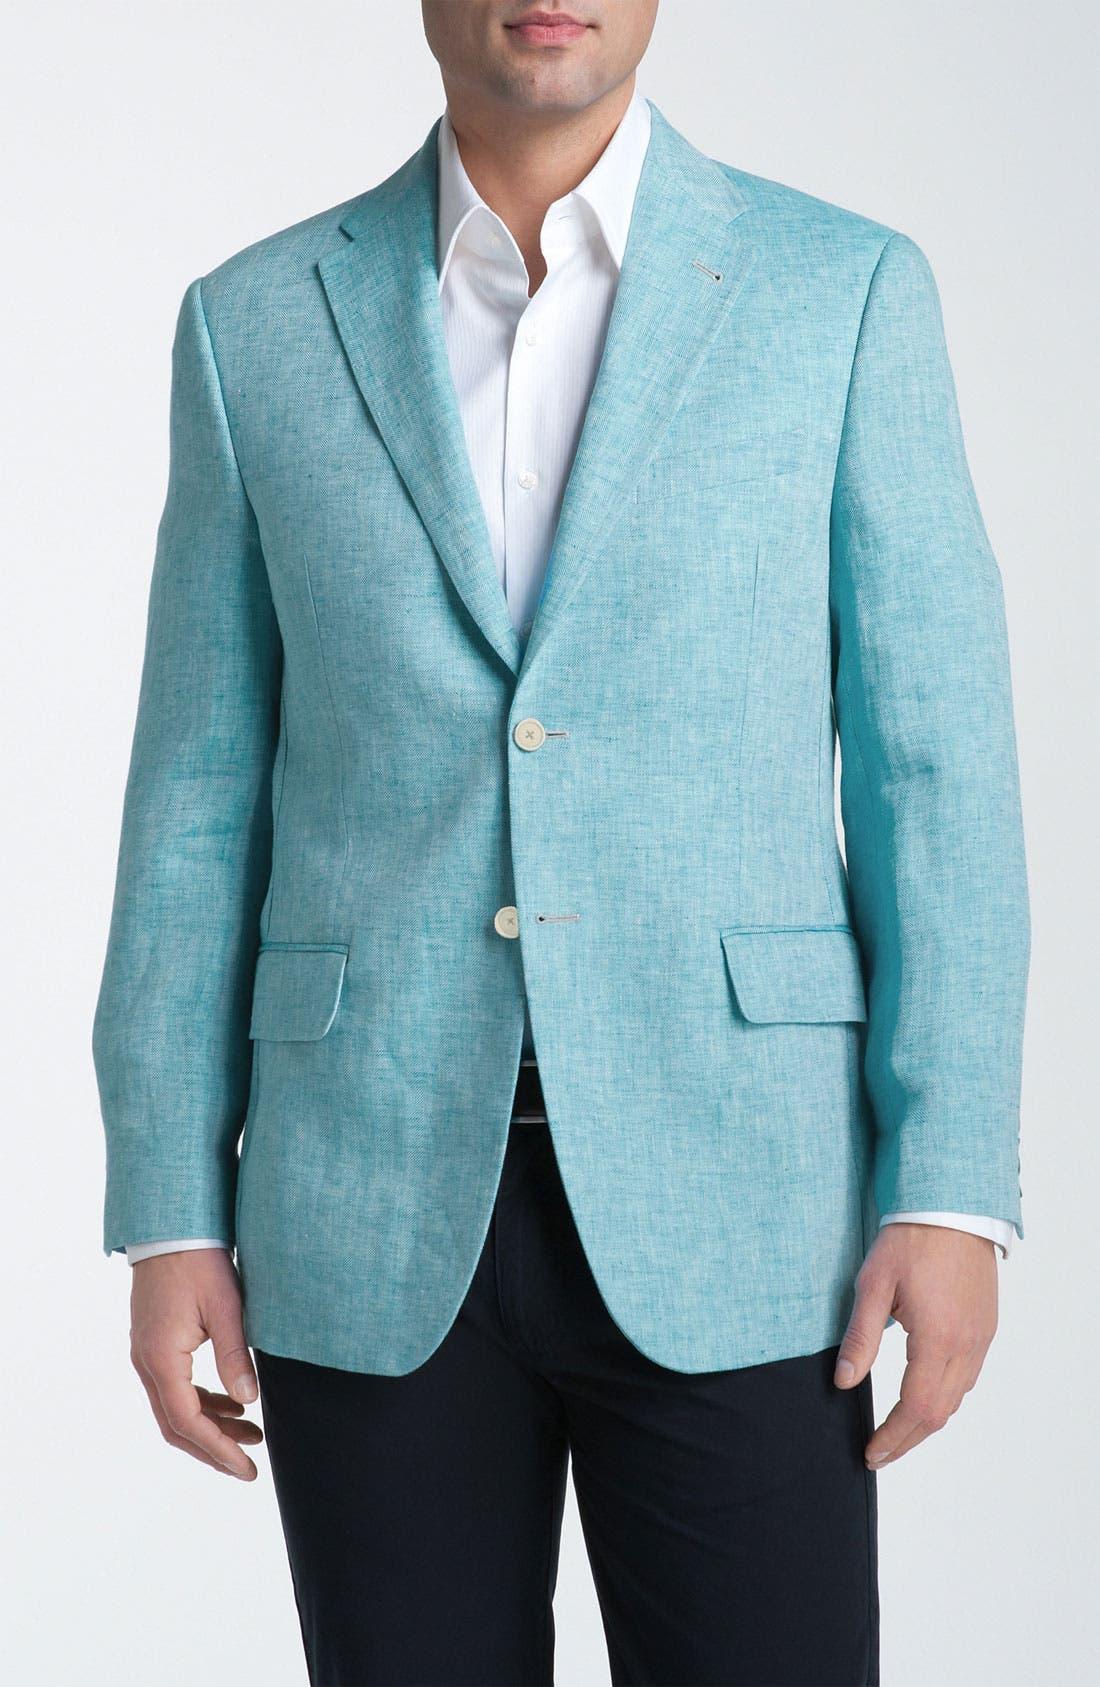 Main Image - Joseph Abboud Herringbone Linen Sportcoat